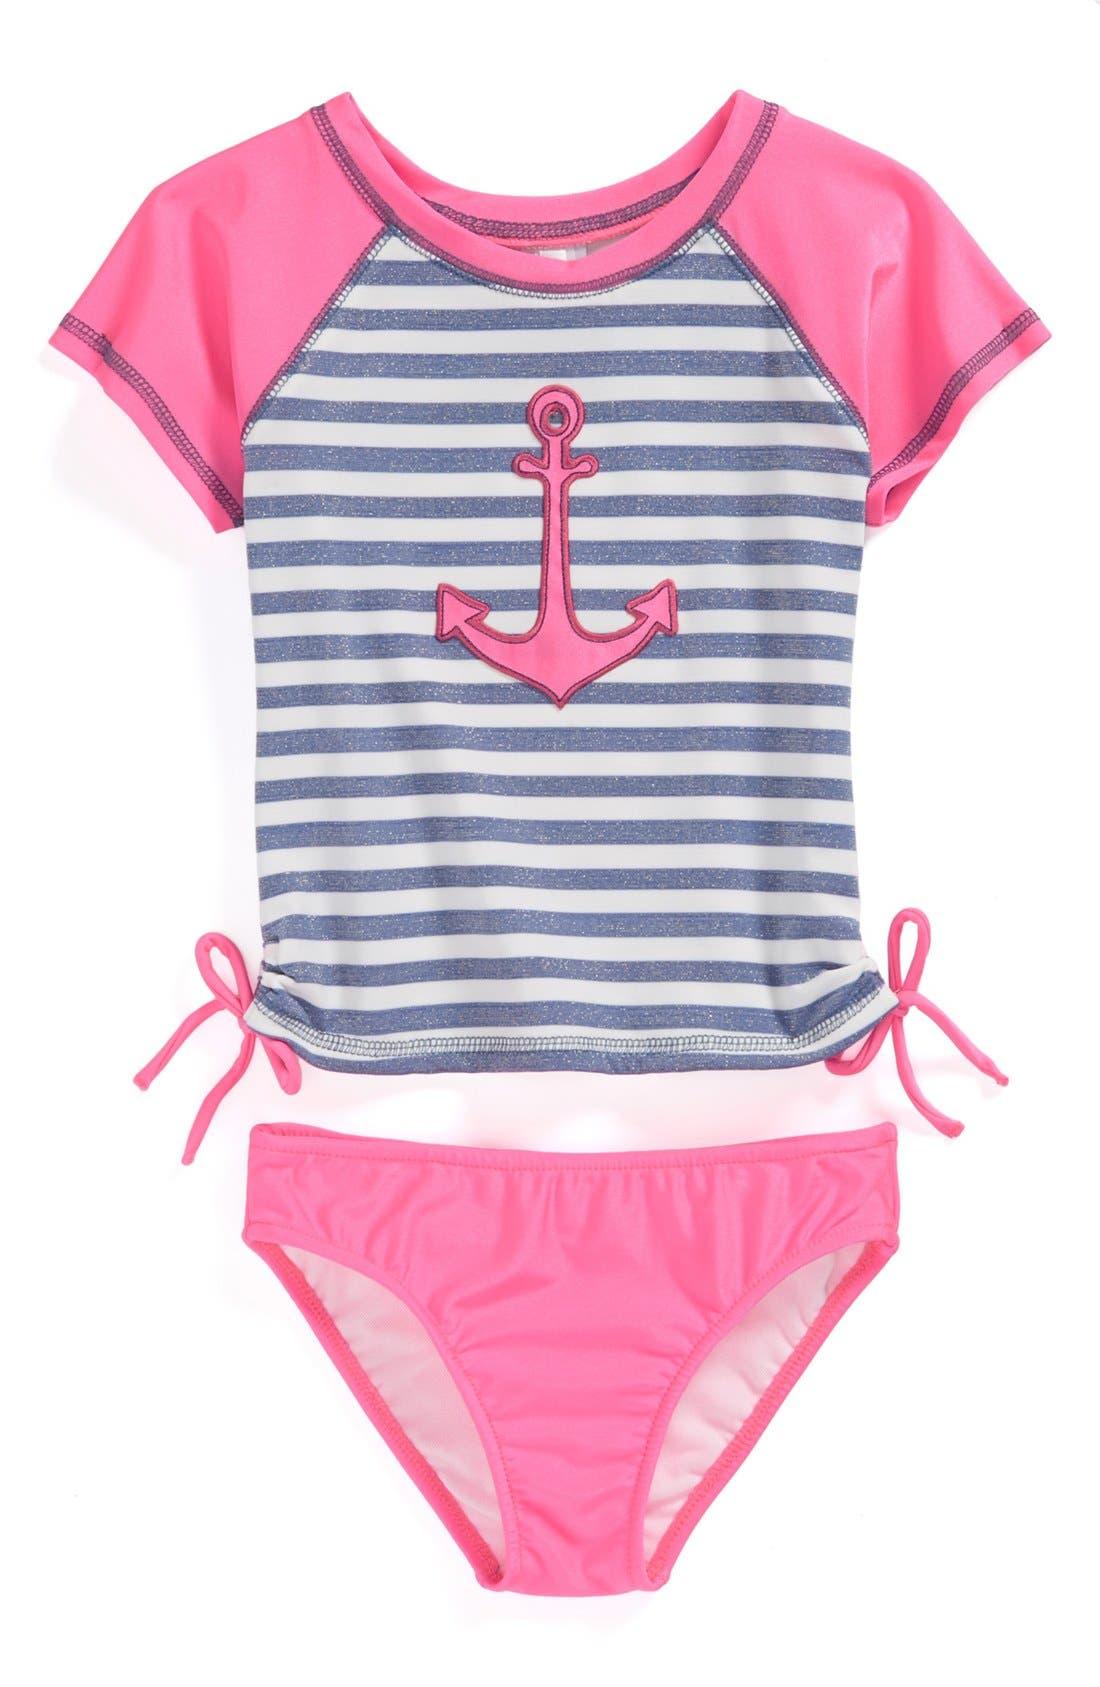 Alternate Image 1 Selected - Love U Lots 'Anchor' Two-Piece Rashguard Swimsuit (Baby Girls)